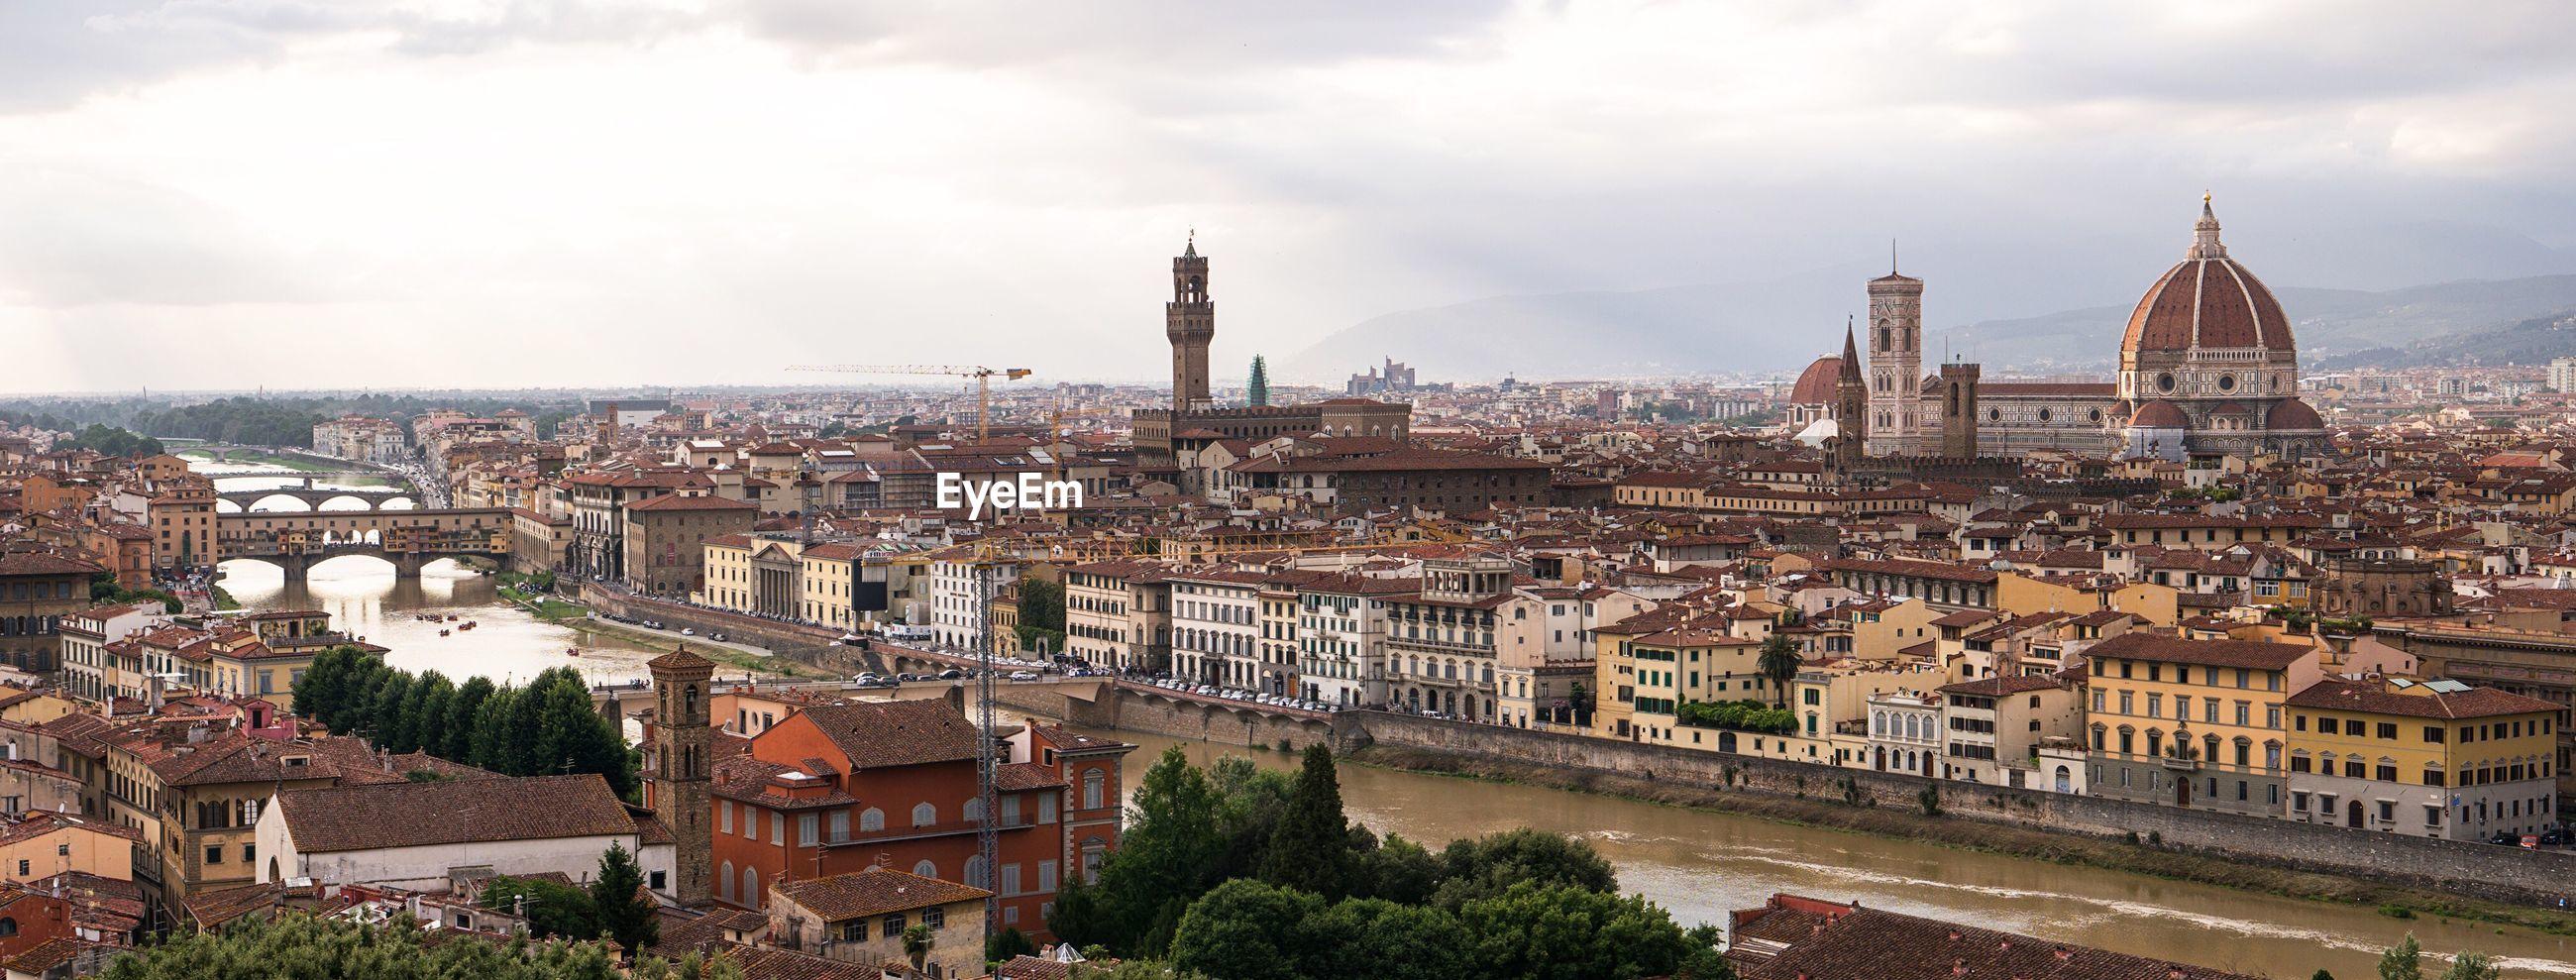 High angle view of ponte vecchio over arno river